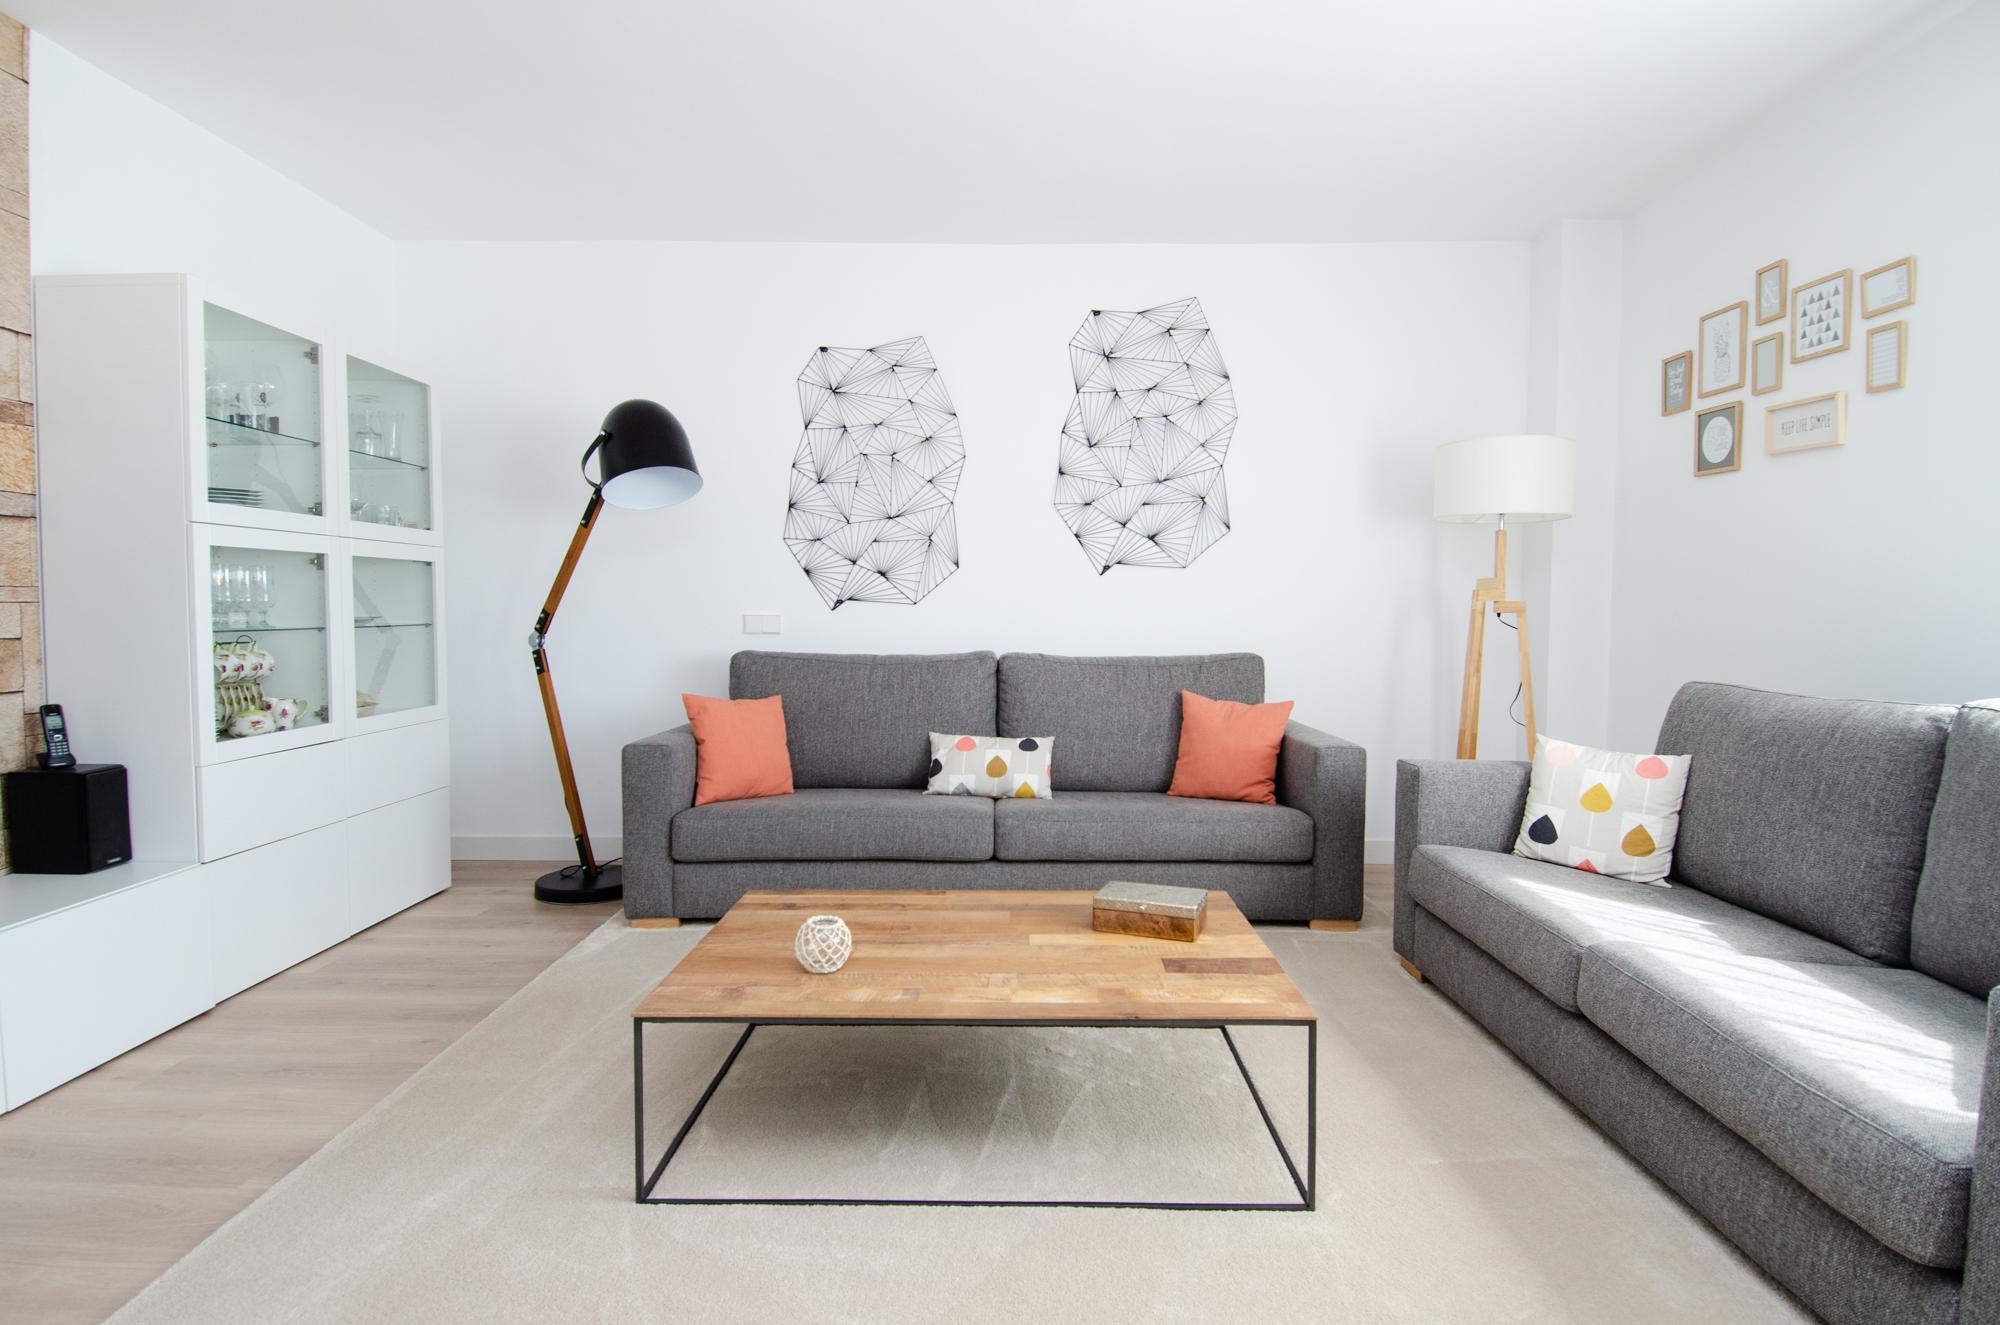 interiorismo-decoracion-ana-de-cabo-reforma-piso-santa-eugenia (4)